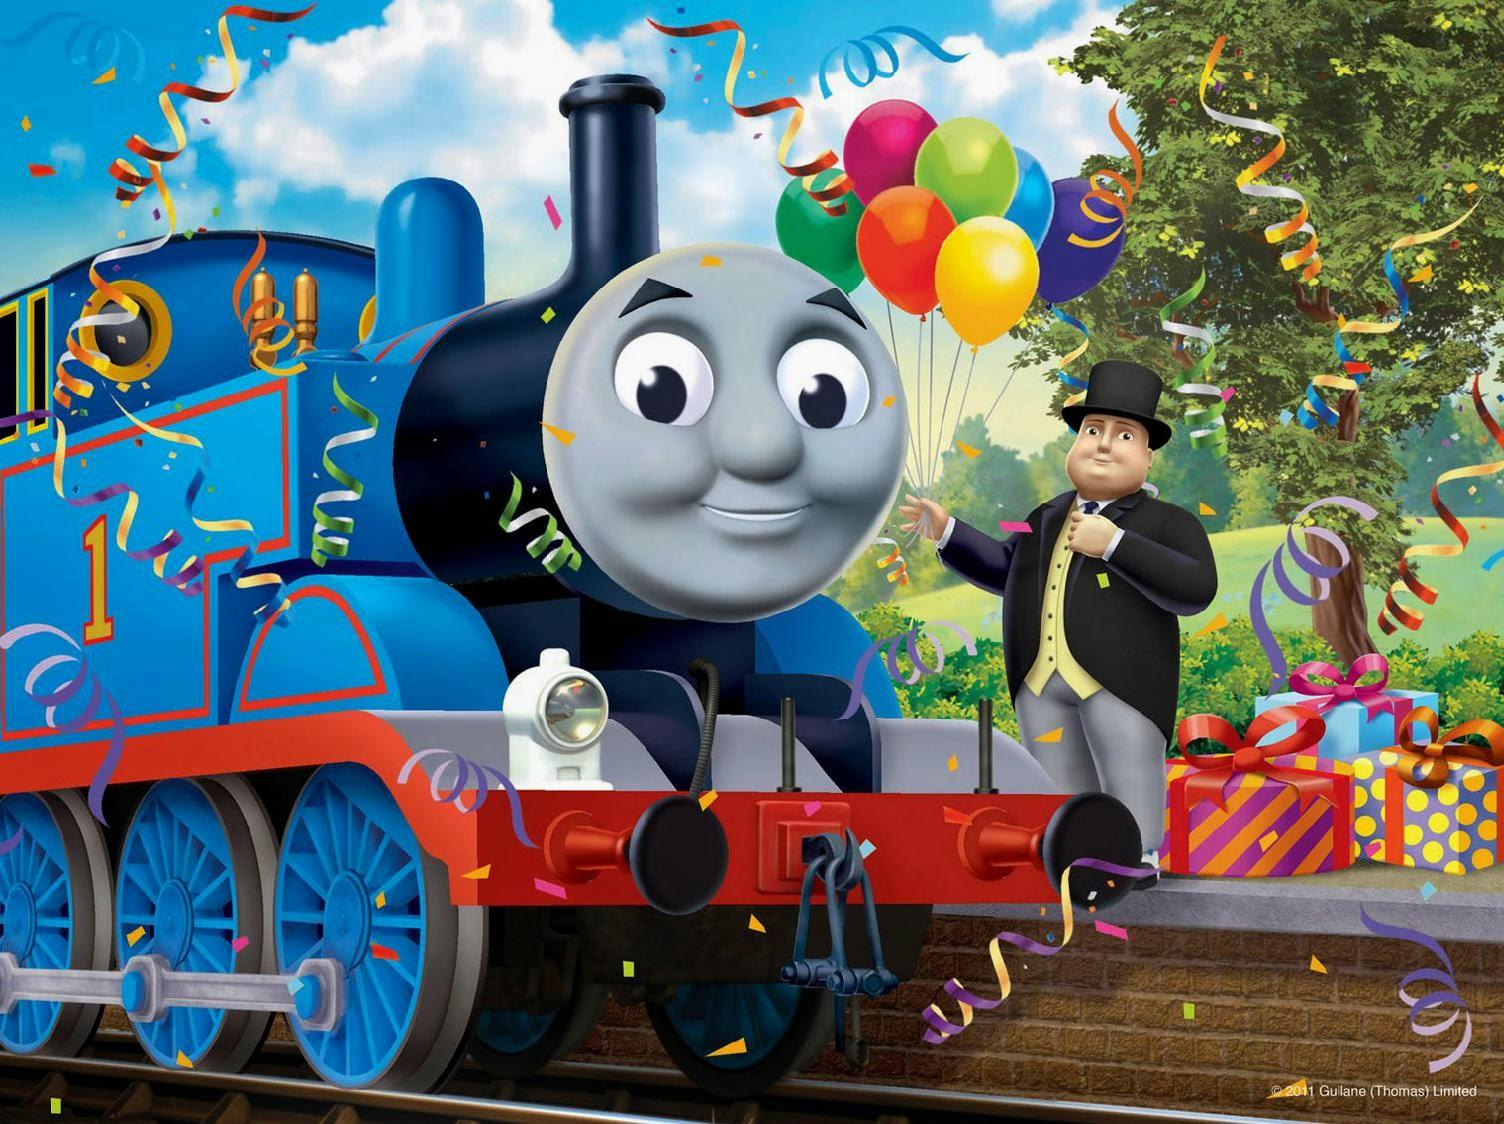 47 ] Thomas And Friends Wallpaper HD On WallpaperSafari